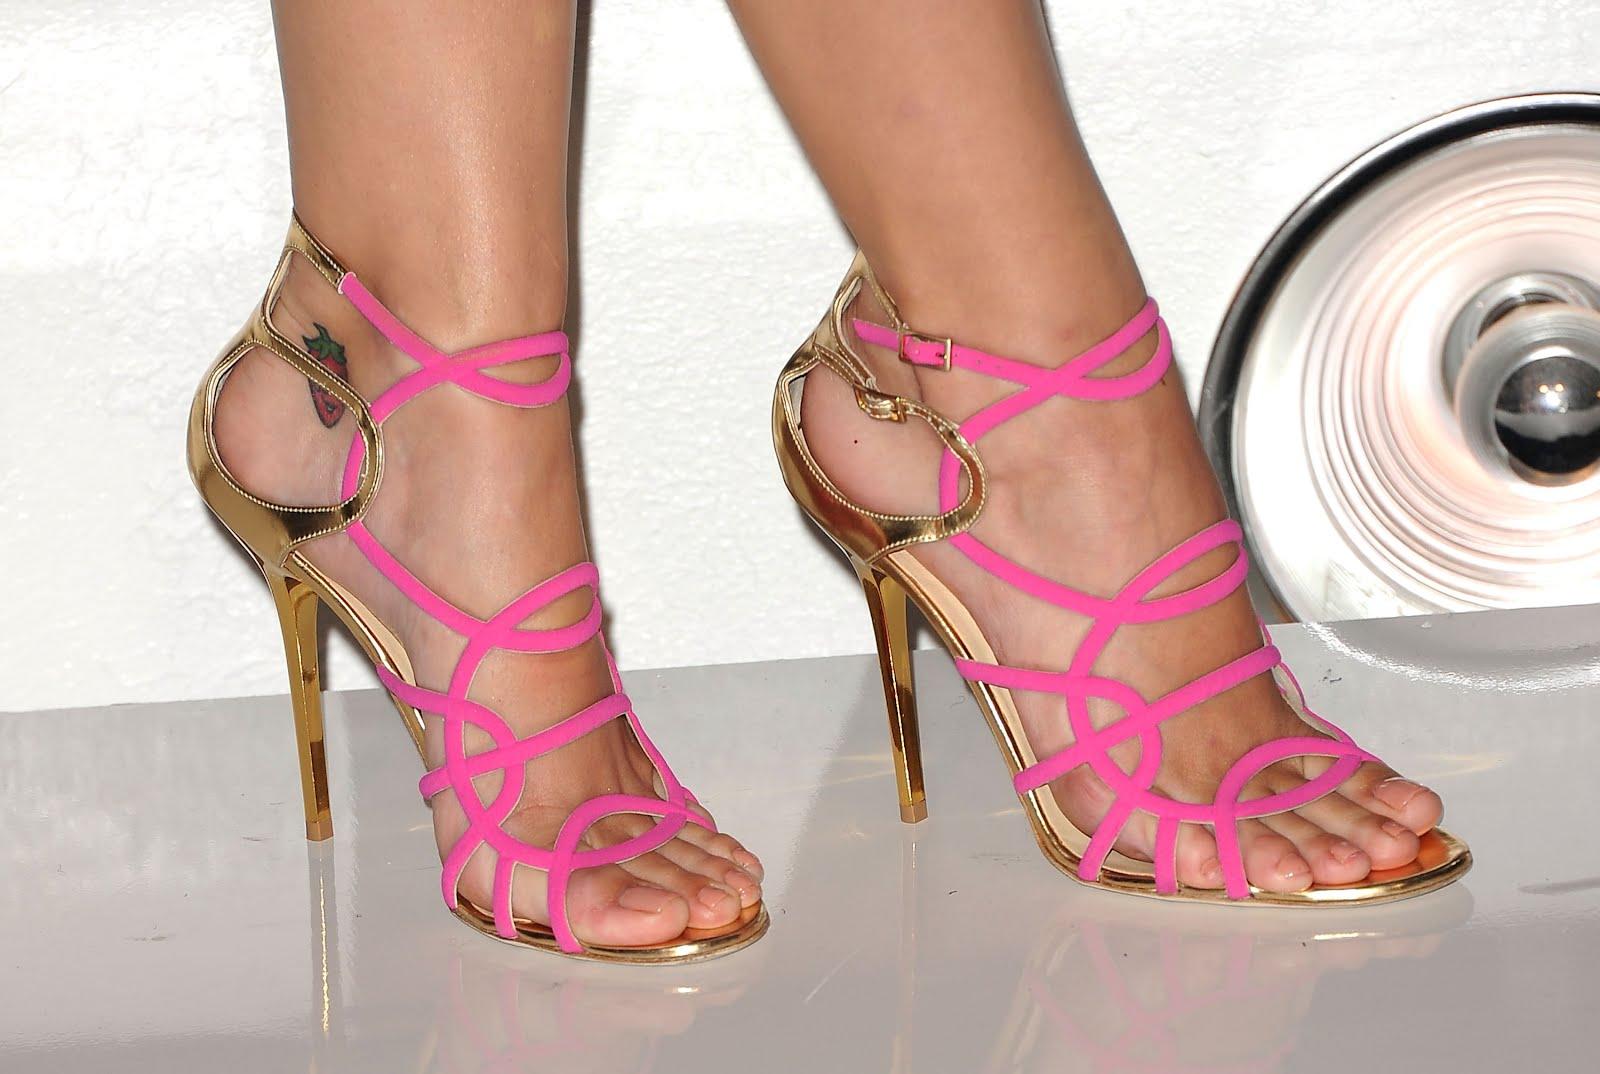 Katy Perry's feet